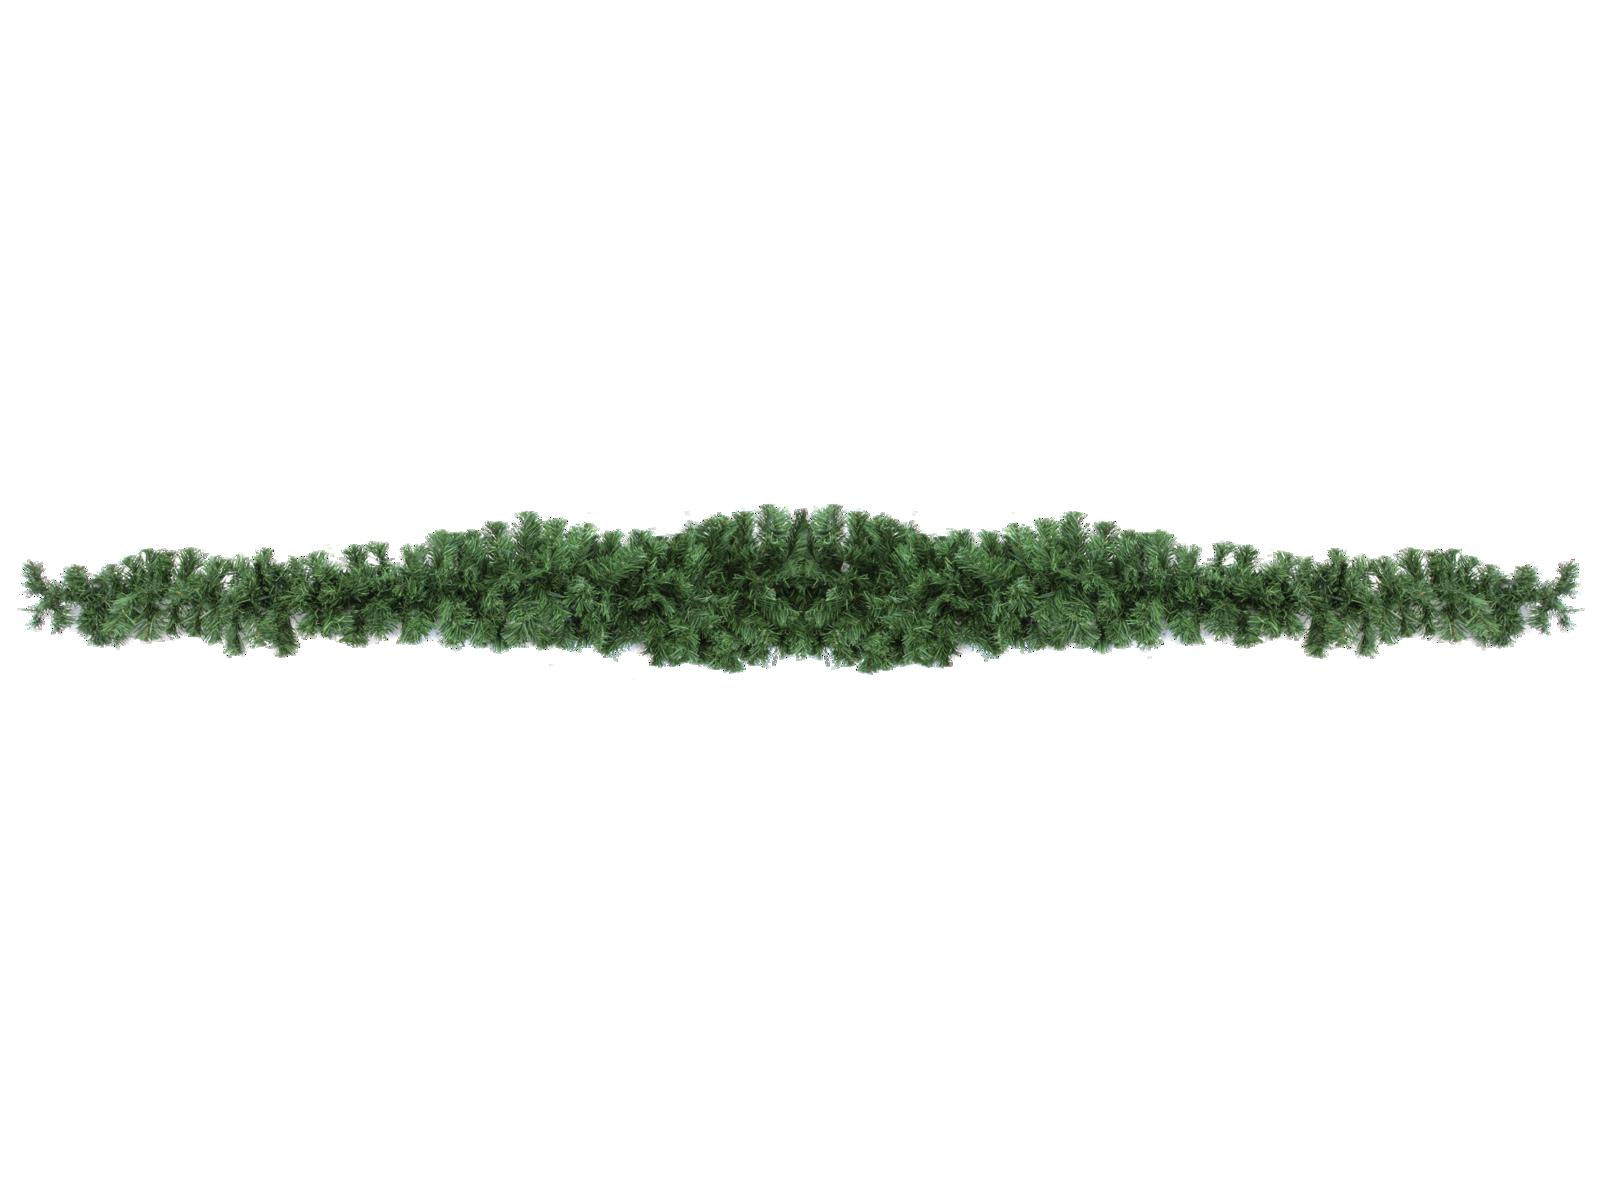 Jedlová girlanda, 270 cm